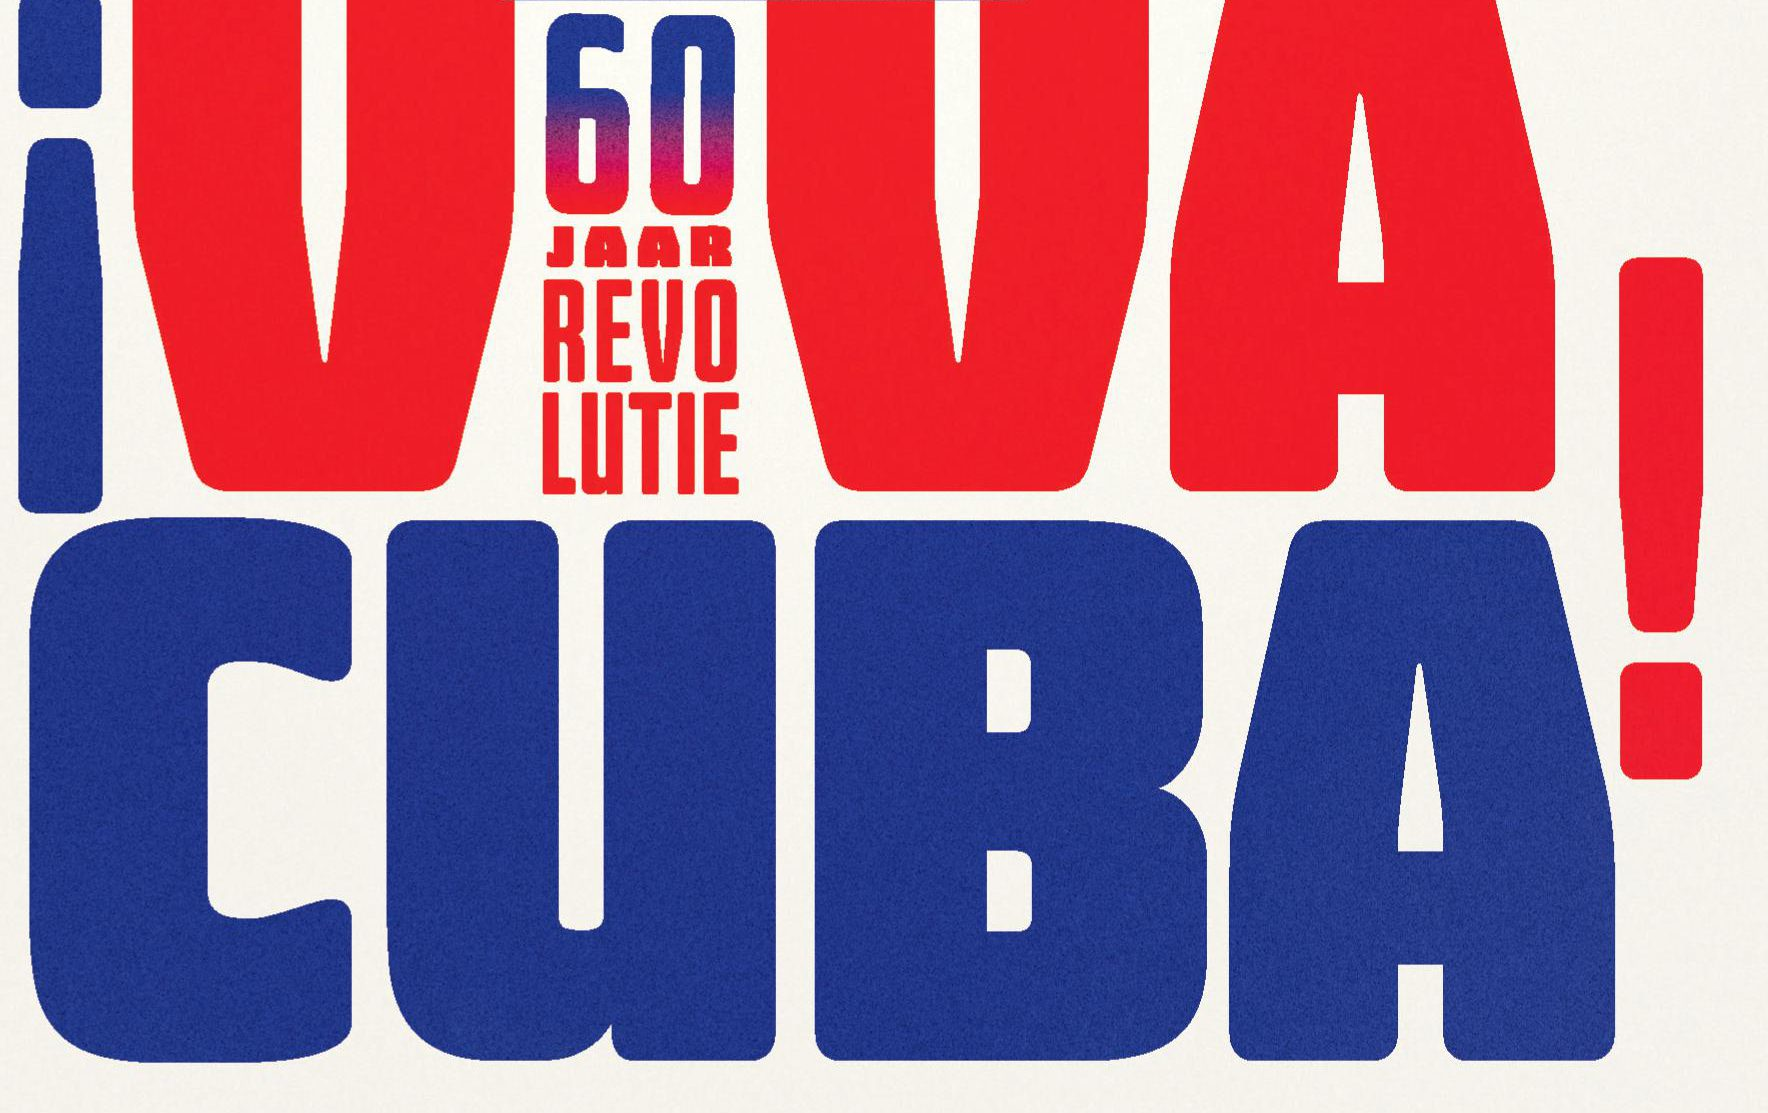 viva-cuba6592